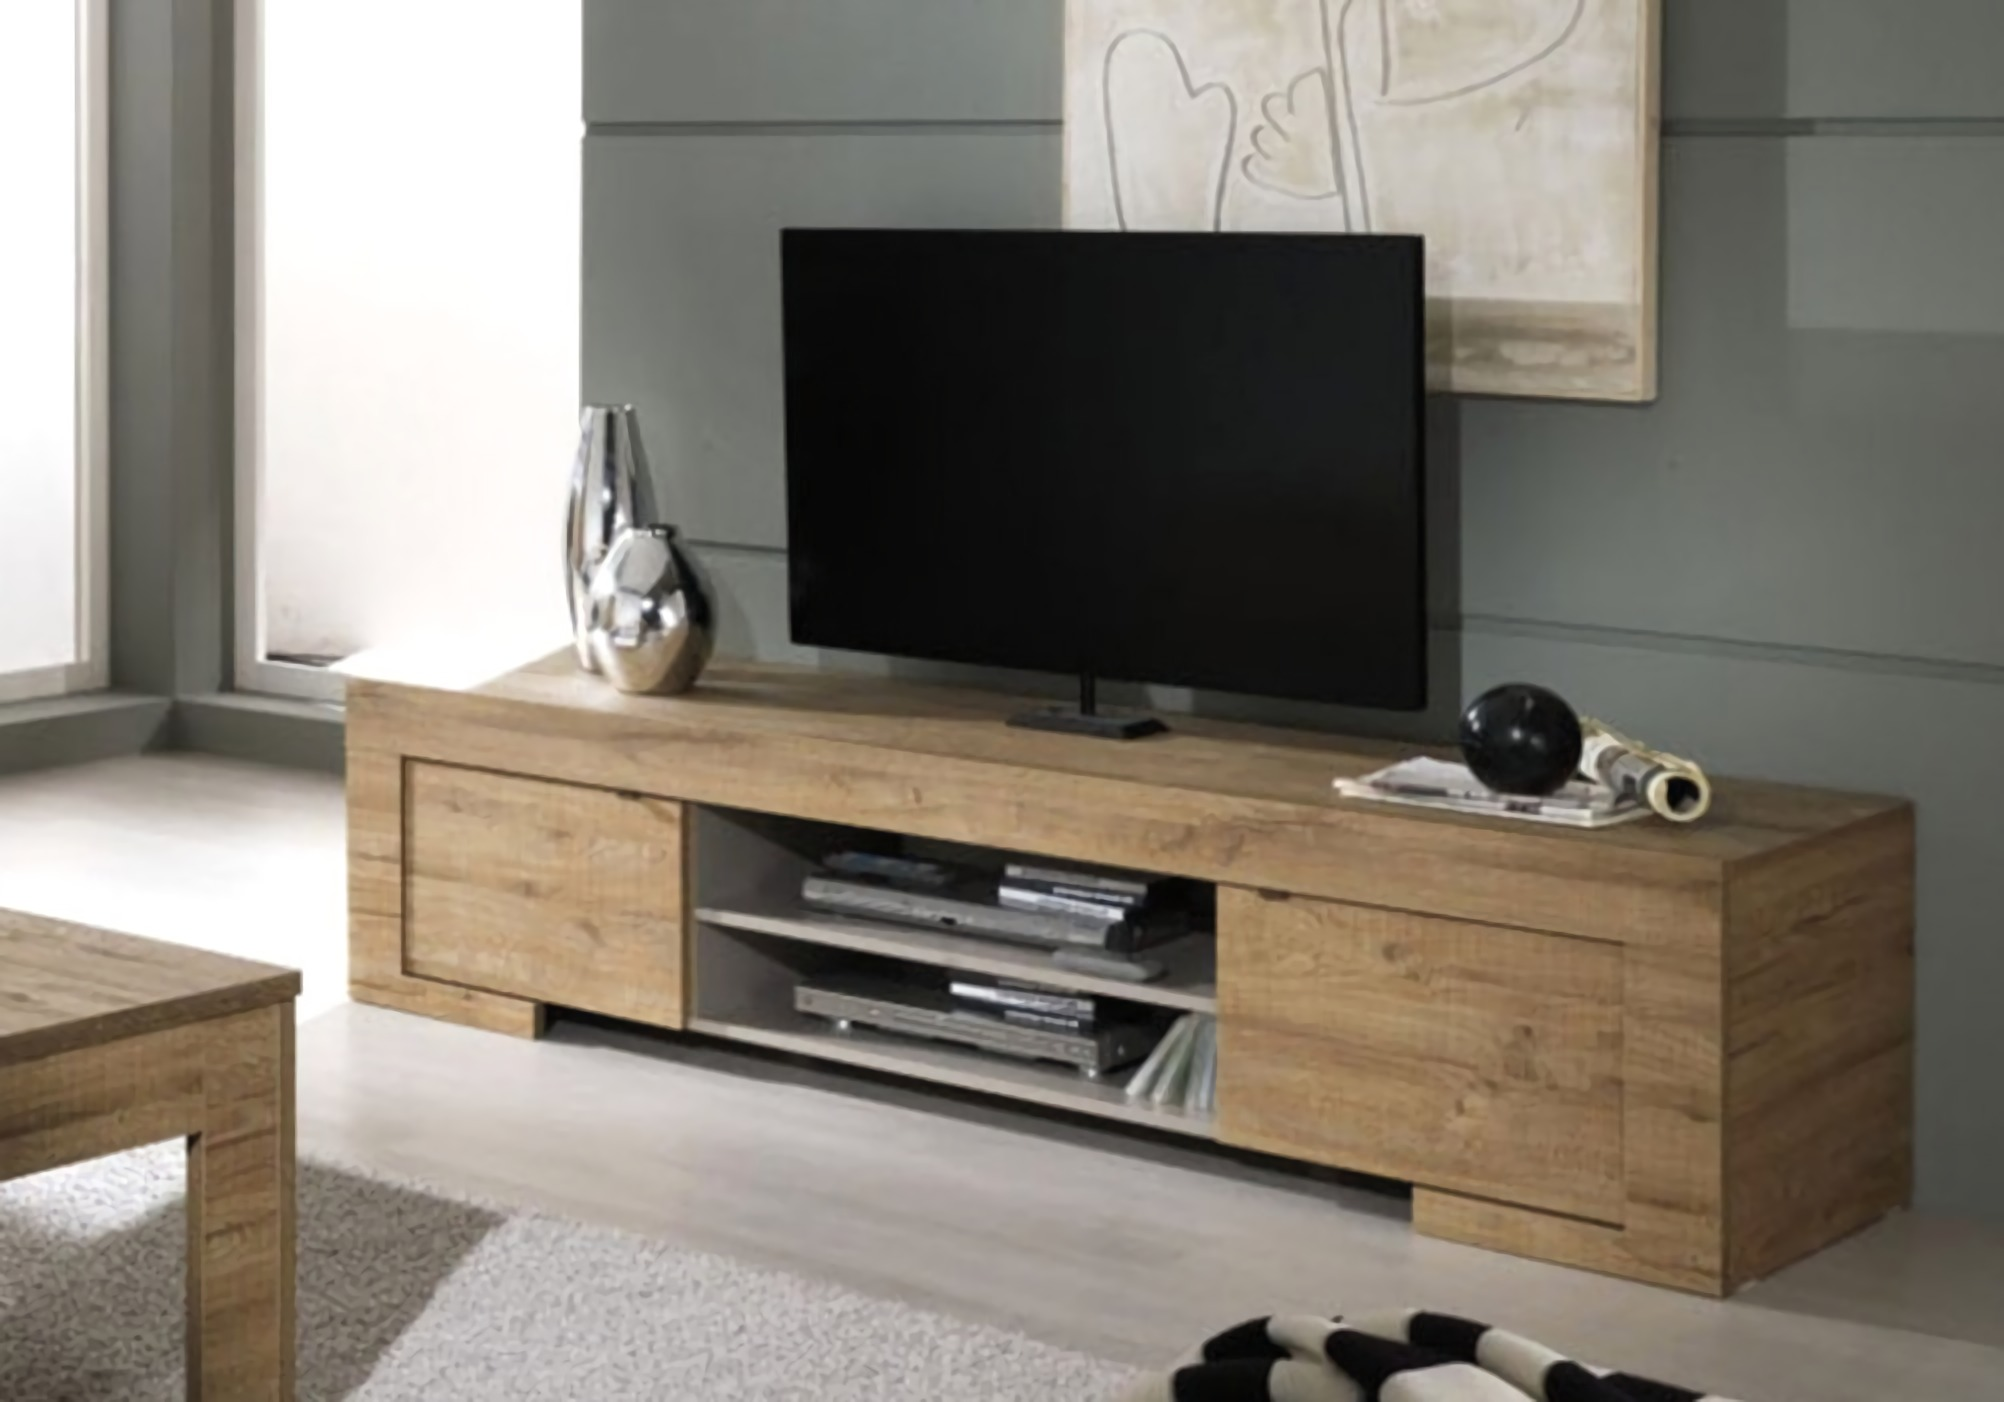 Ikea meuble tv vintage